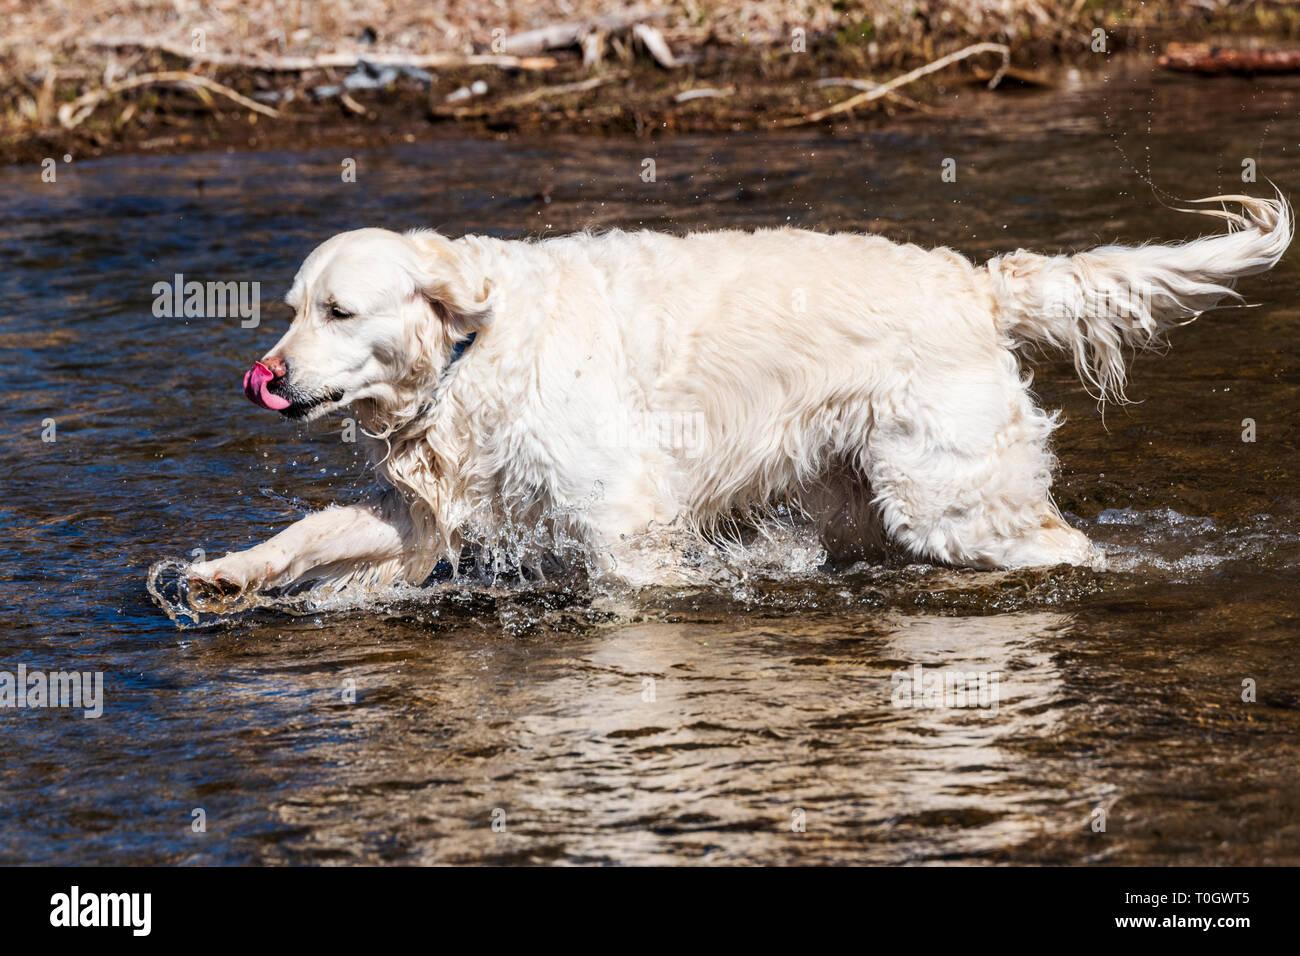 Platinum colored Golden Retriever dog playing in the South Arkansas River, Salida, Colorado, USA - Stock Image